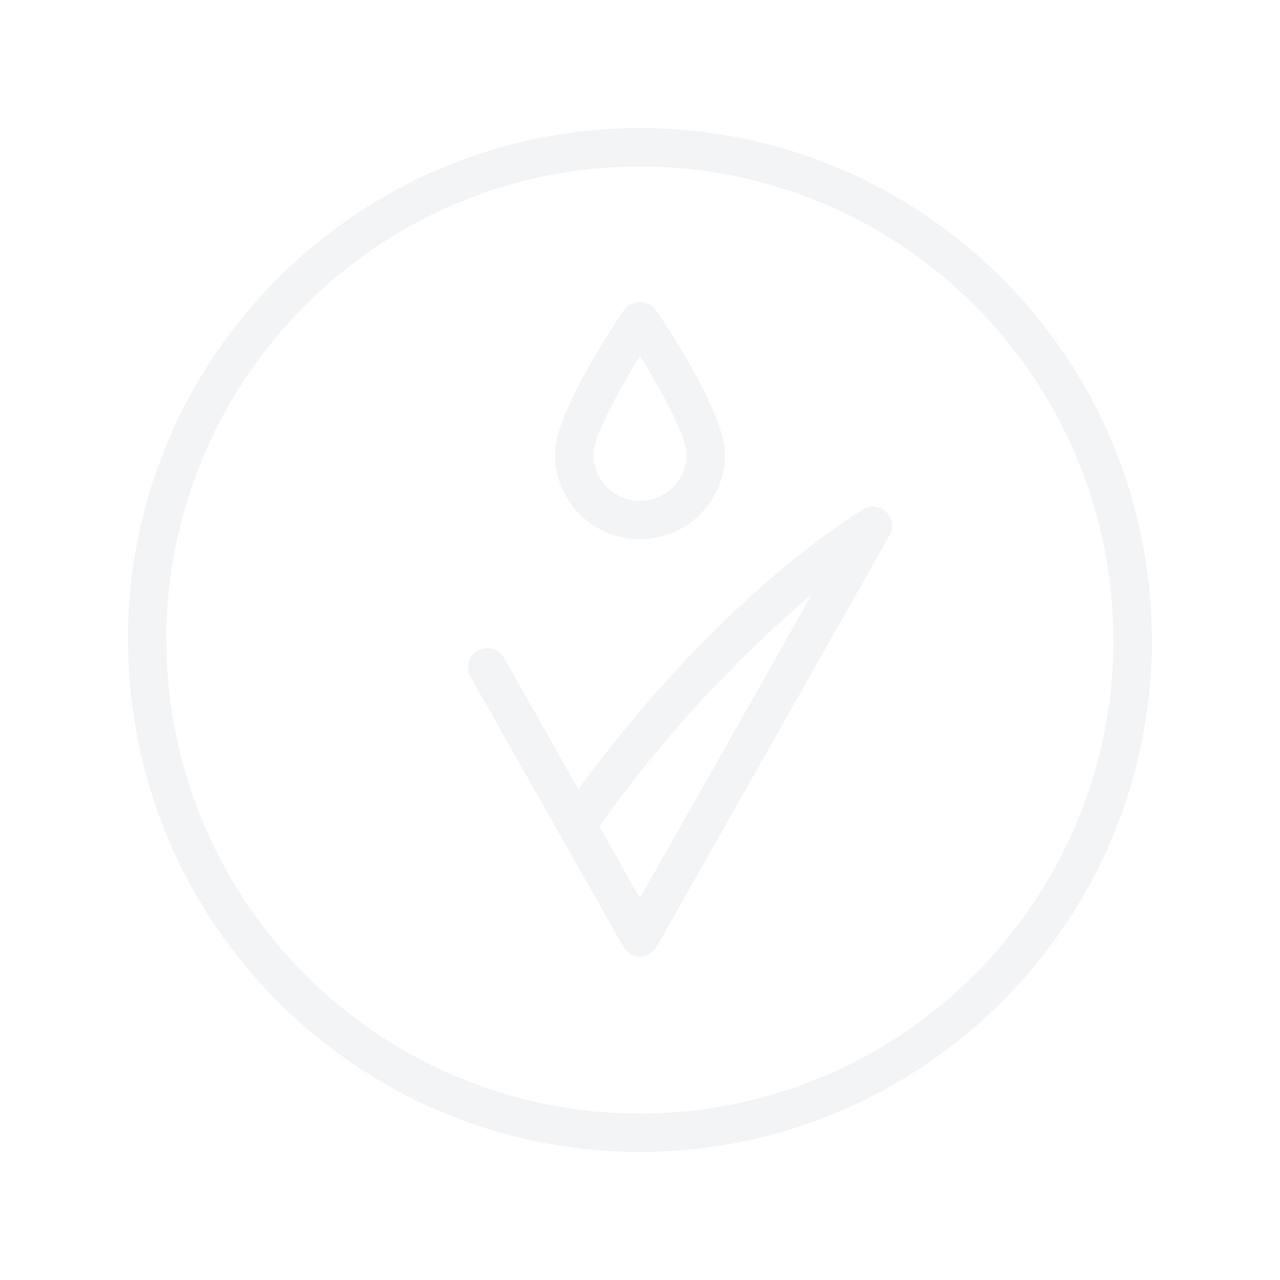 Dior Homme Cologne 2013 EDC 125ml